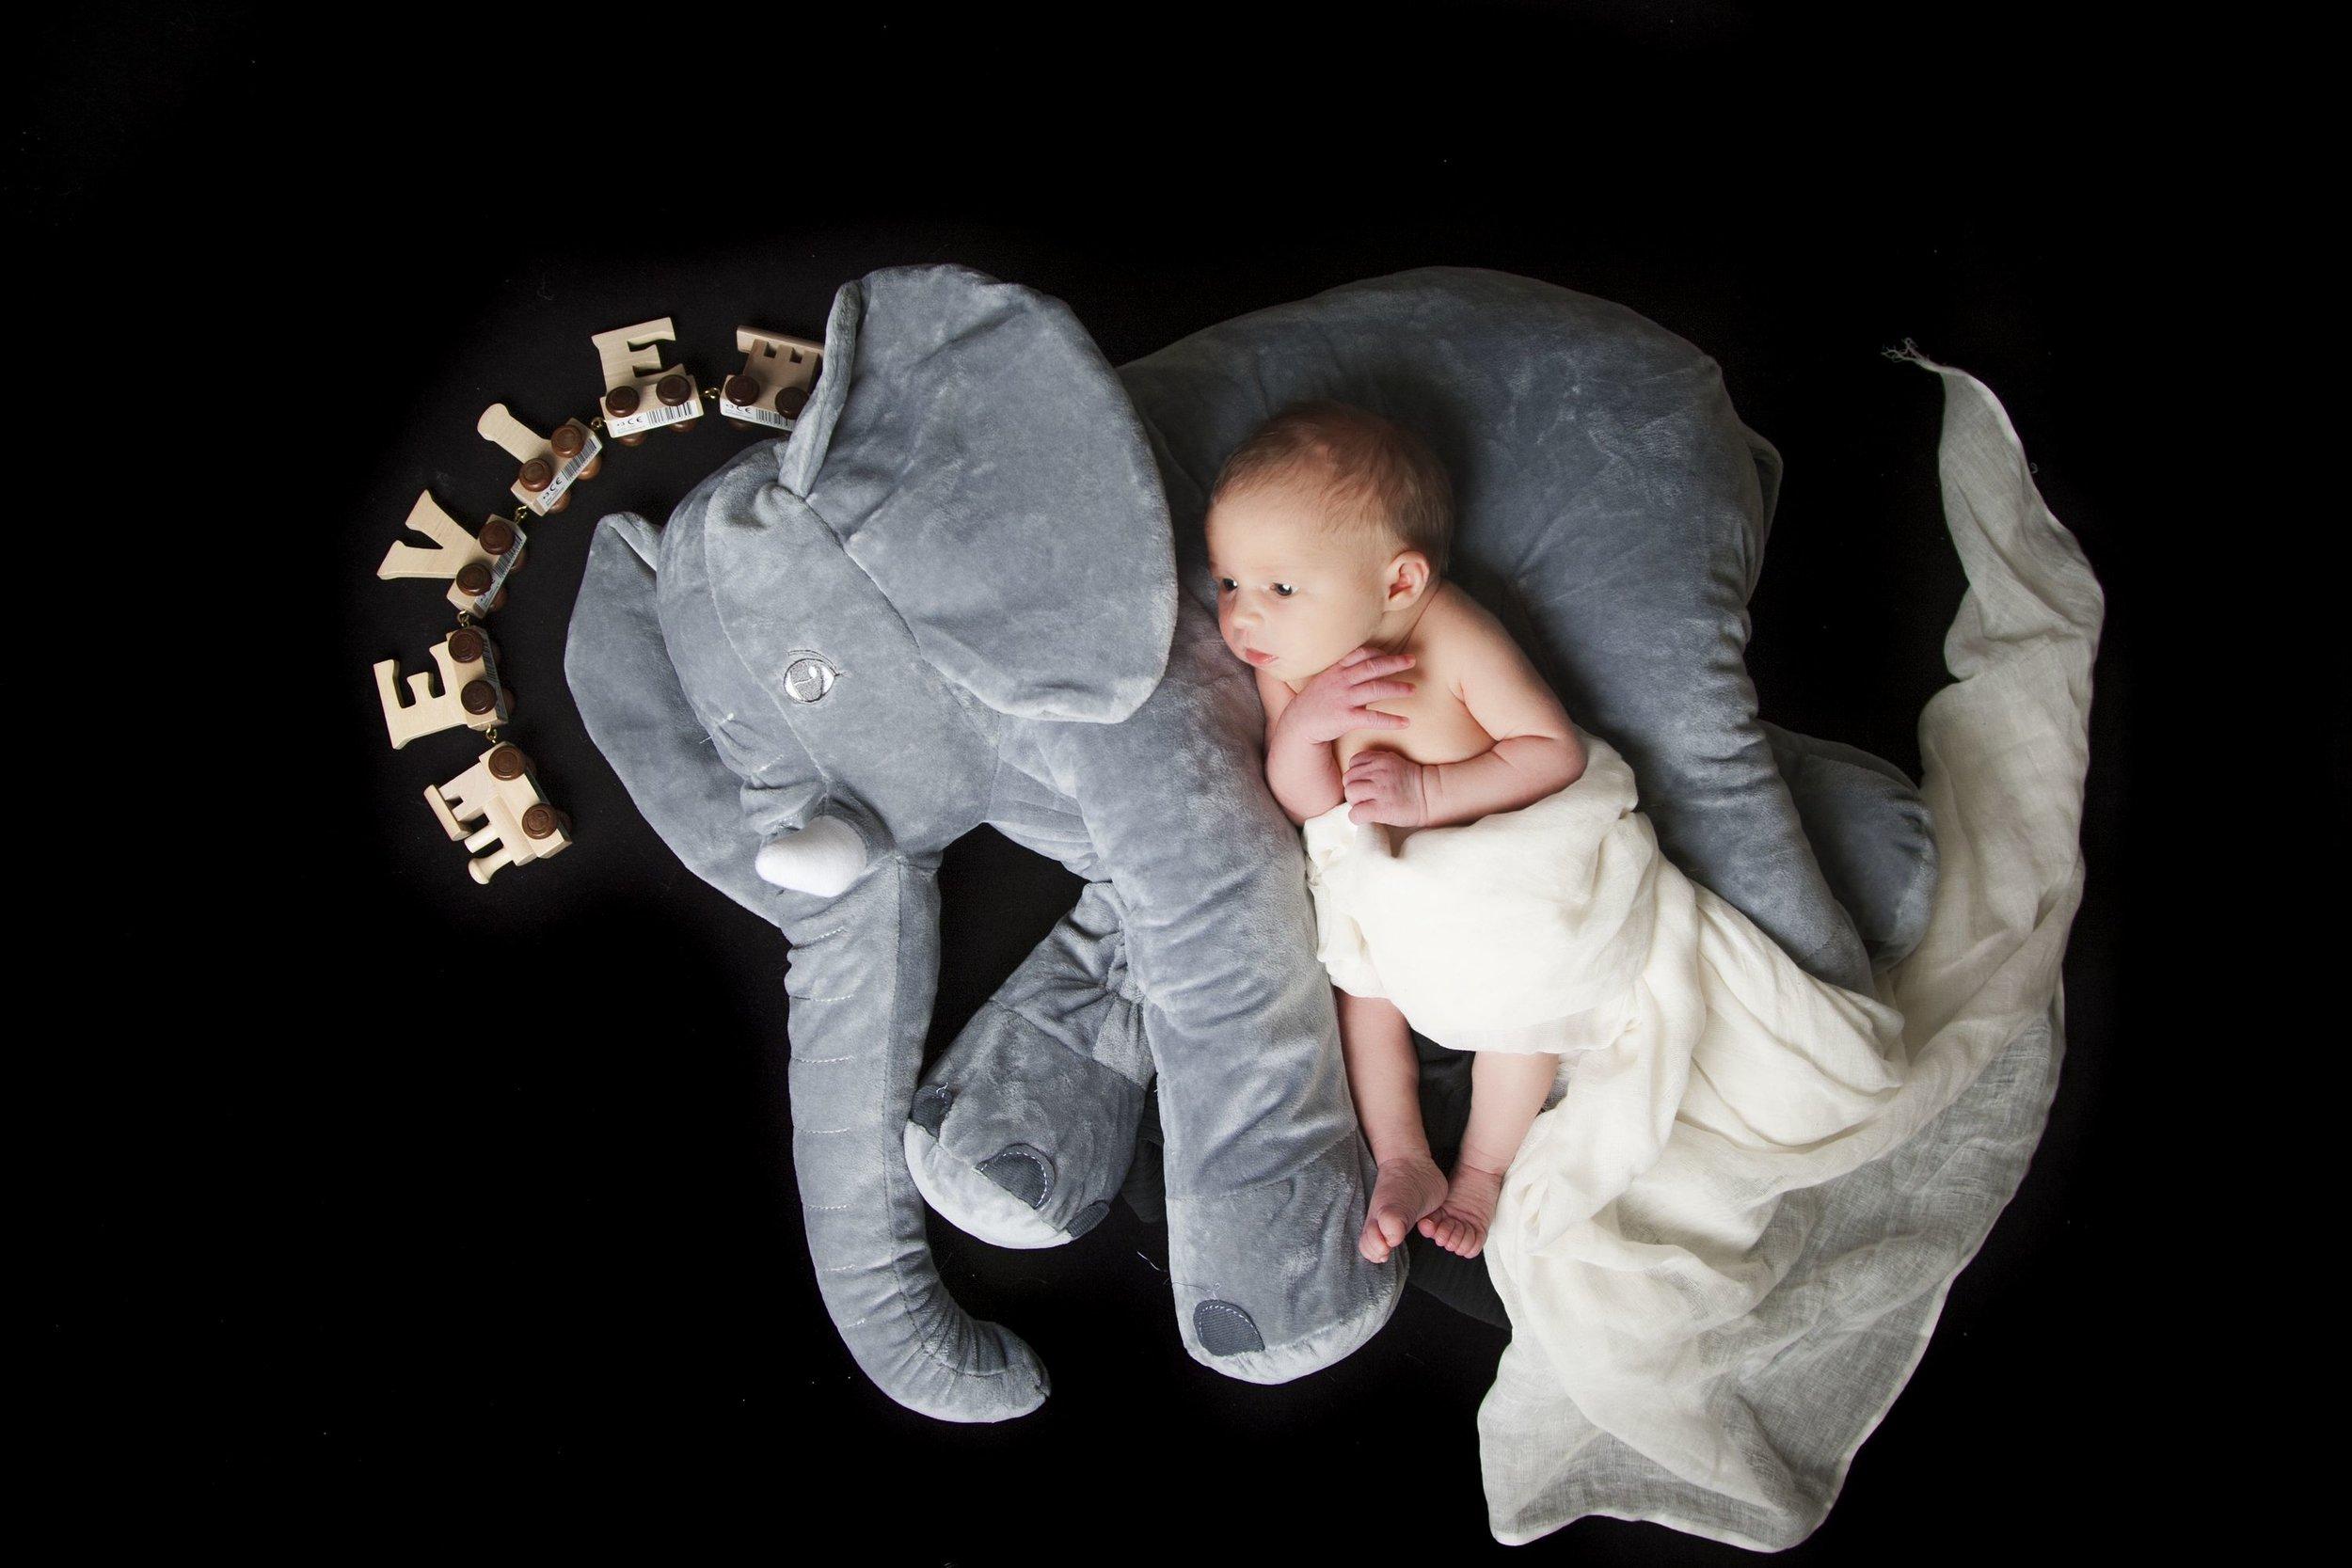 newborn-photographer-leicester-baby-photography-shoot-photo-props-elephant-ideas-props-zigzag-zig-zag.JPG